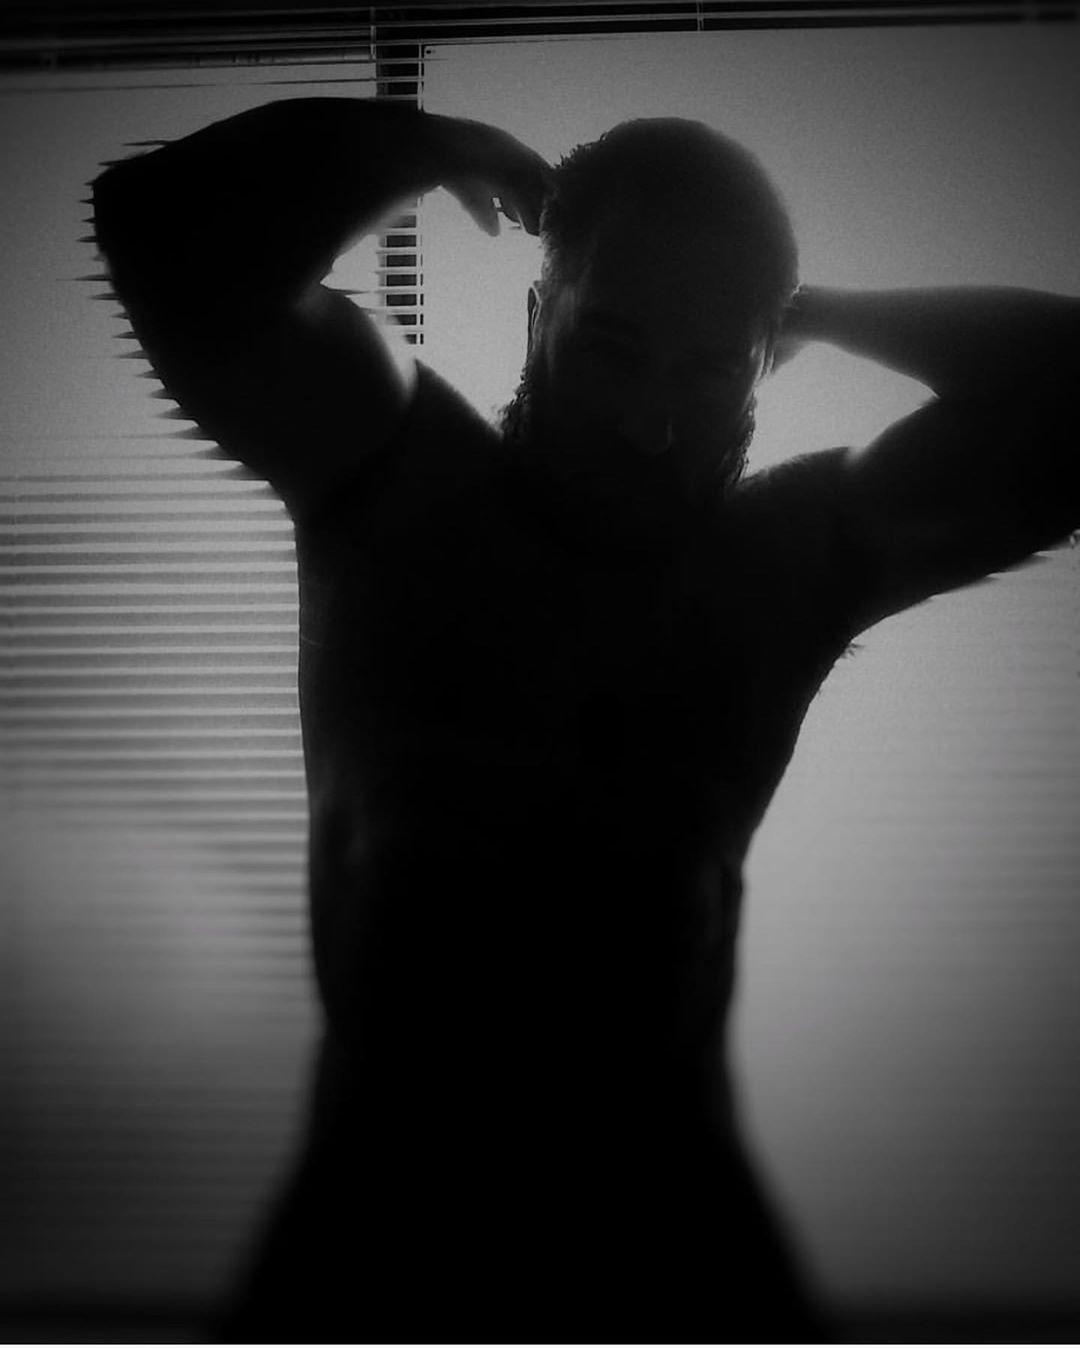 Shadow Repost جمالك حلاقة Instafit Instmen Strong لحية ذقن دقن رجل رجال ستايل Beard Beards Beardsma Human Silhouette Instagram Posts Instagram